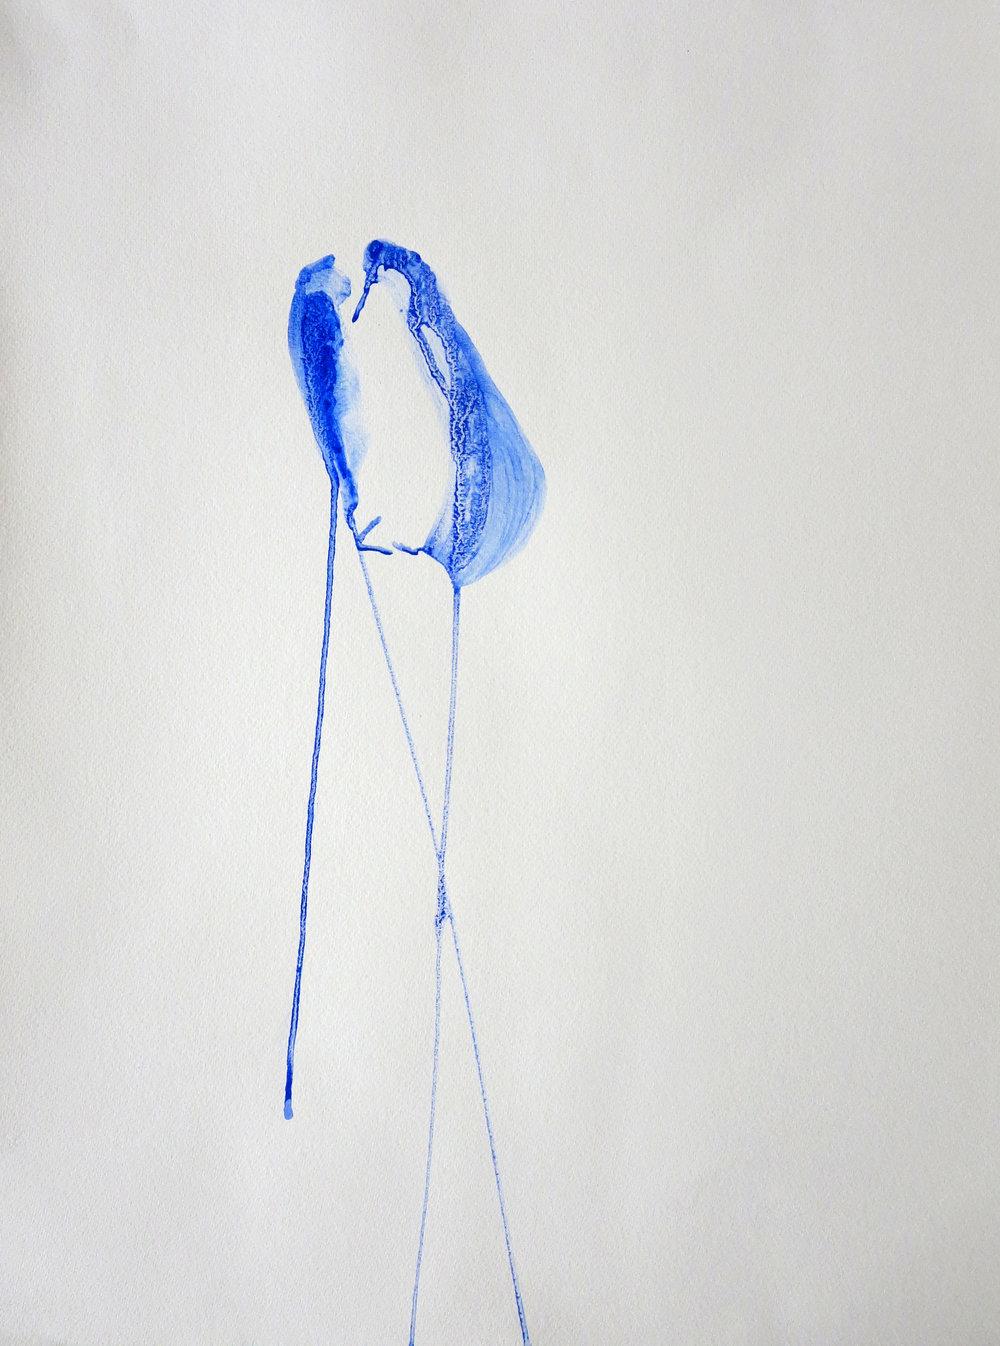 Elle ou Lui (Her or Him), 2016